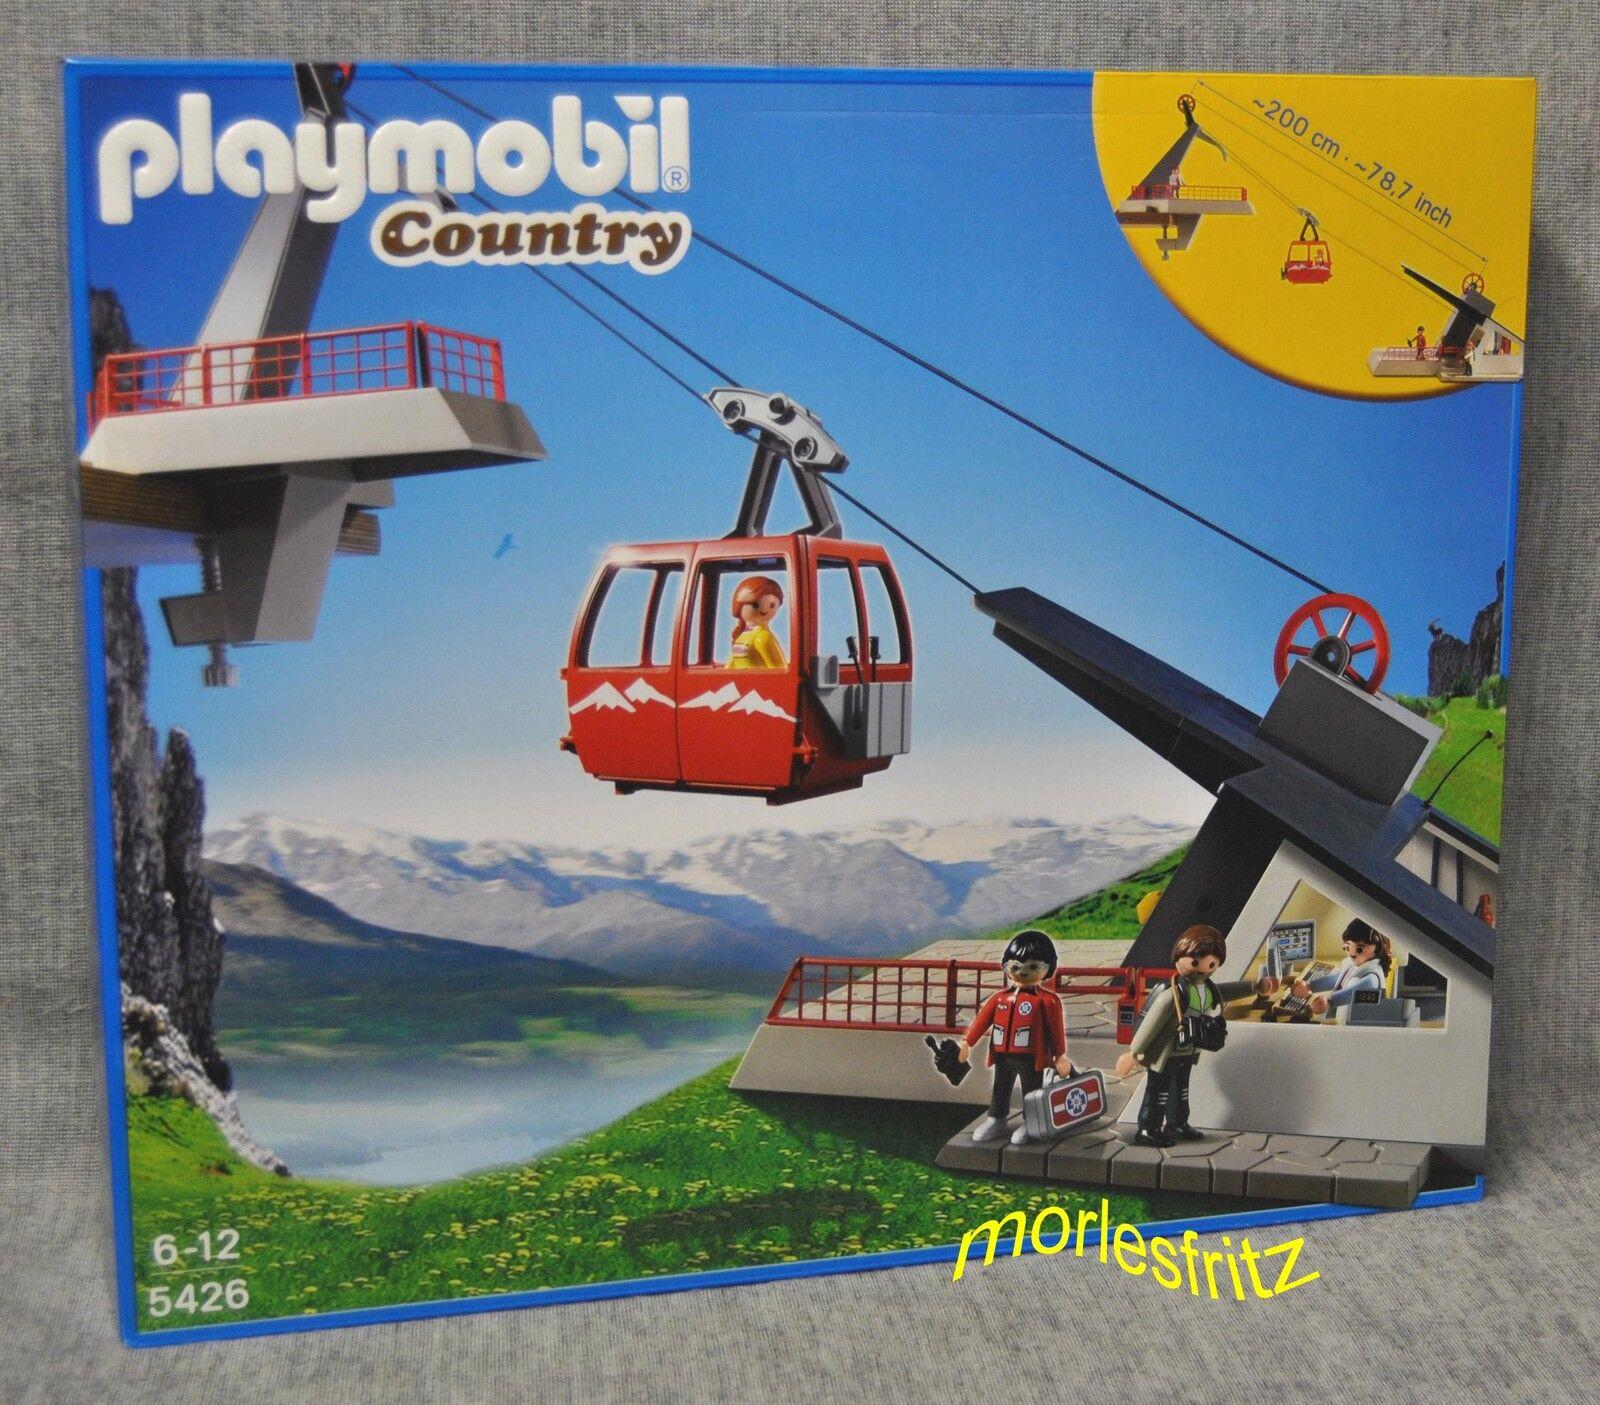 Playmobil 5426 Seilbahn mit Bergstation - Country - Neu